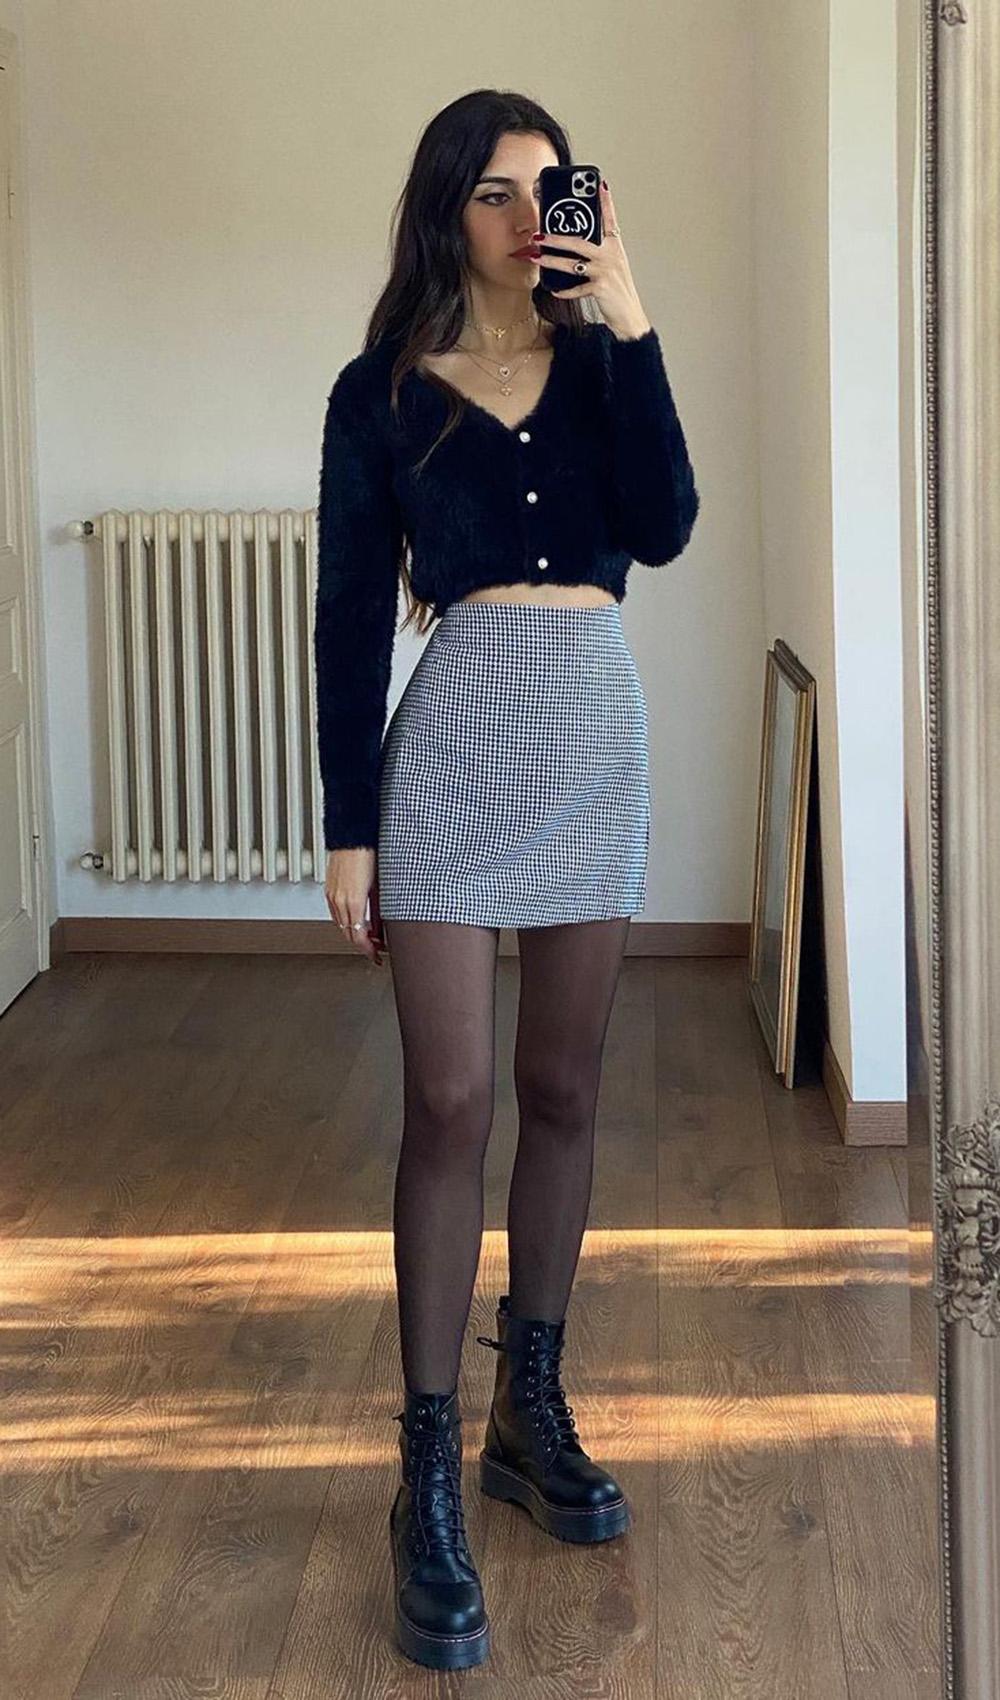 suéter preto, saia xadre vichy, meia calça e coturno